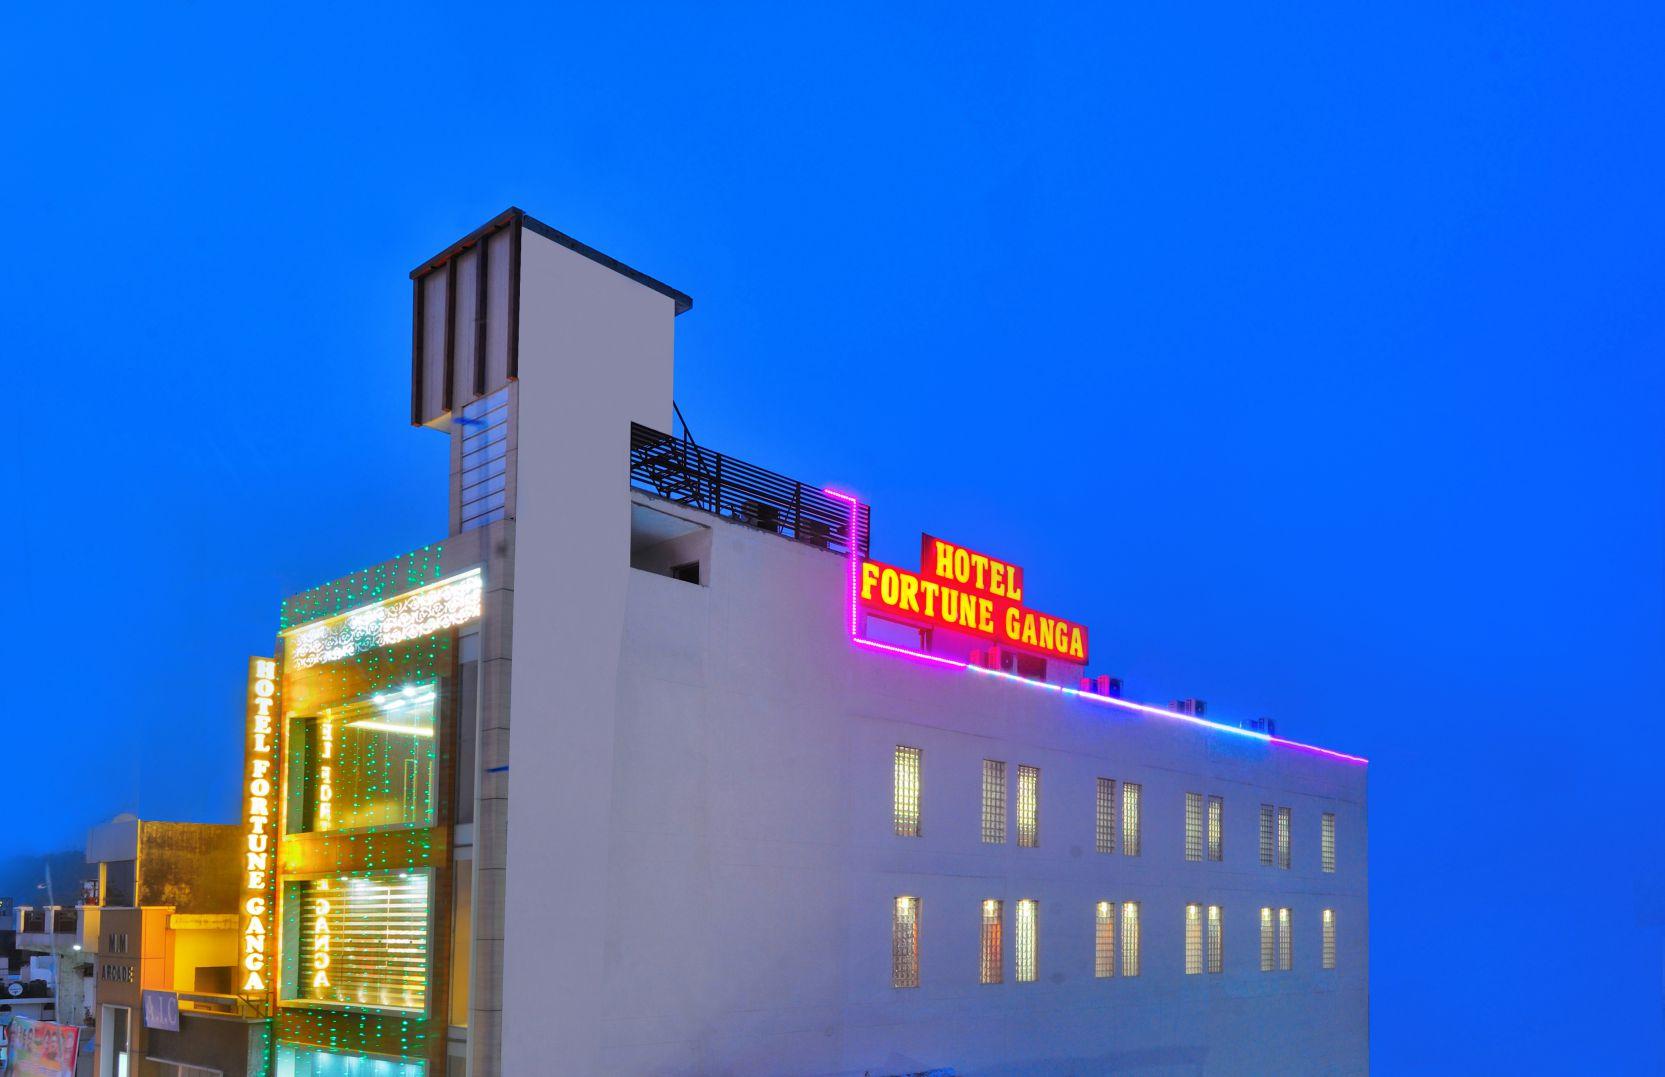 Hotel Fortune Ganga - Jawalapur - Haridwar Image